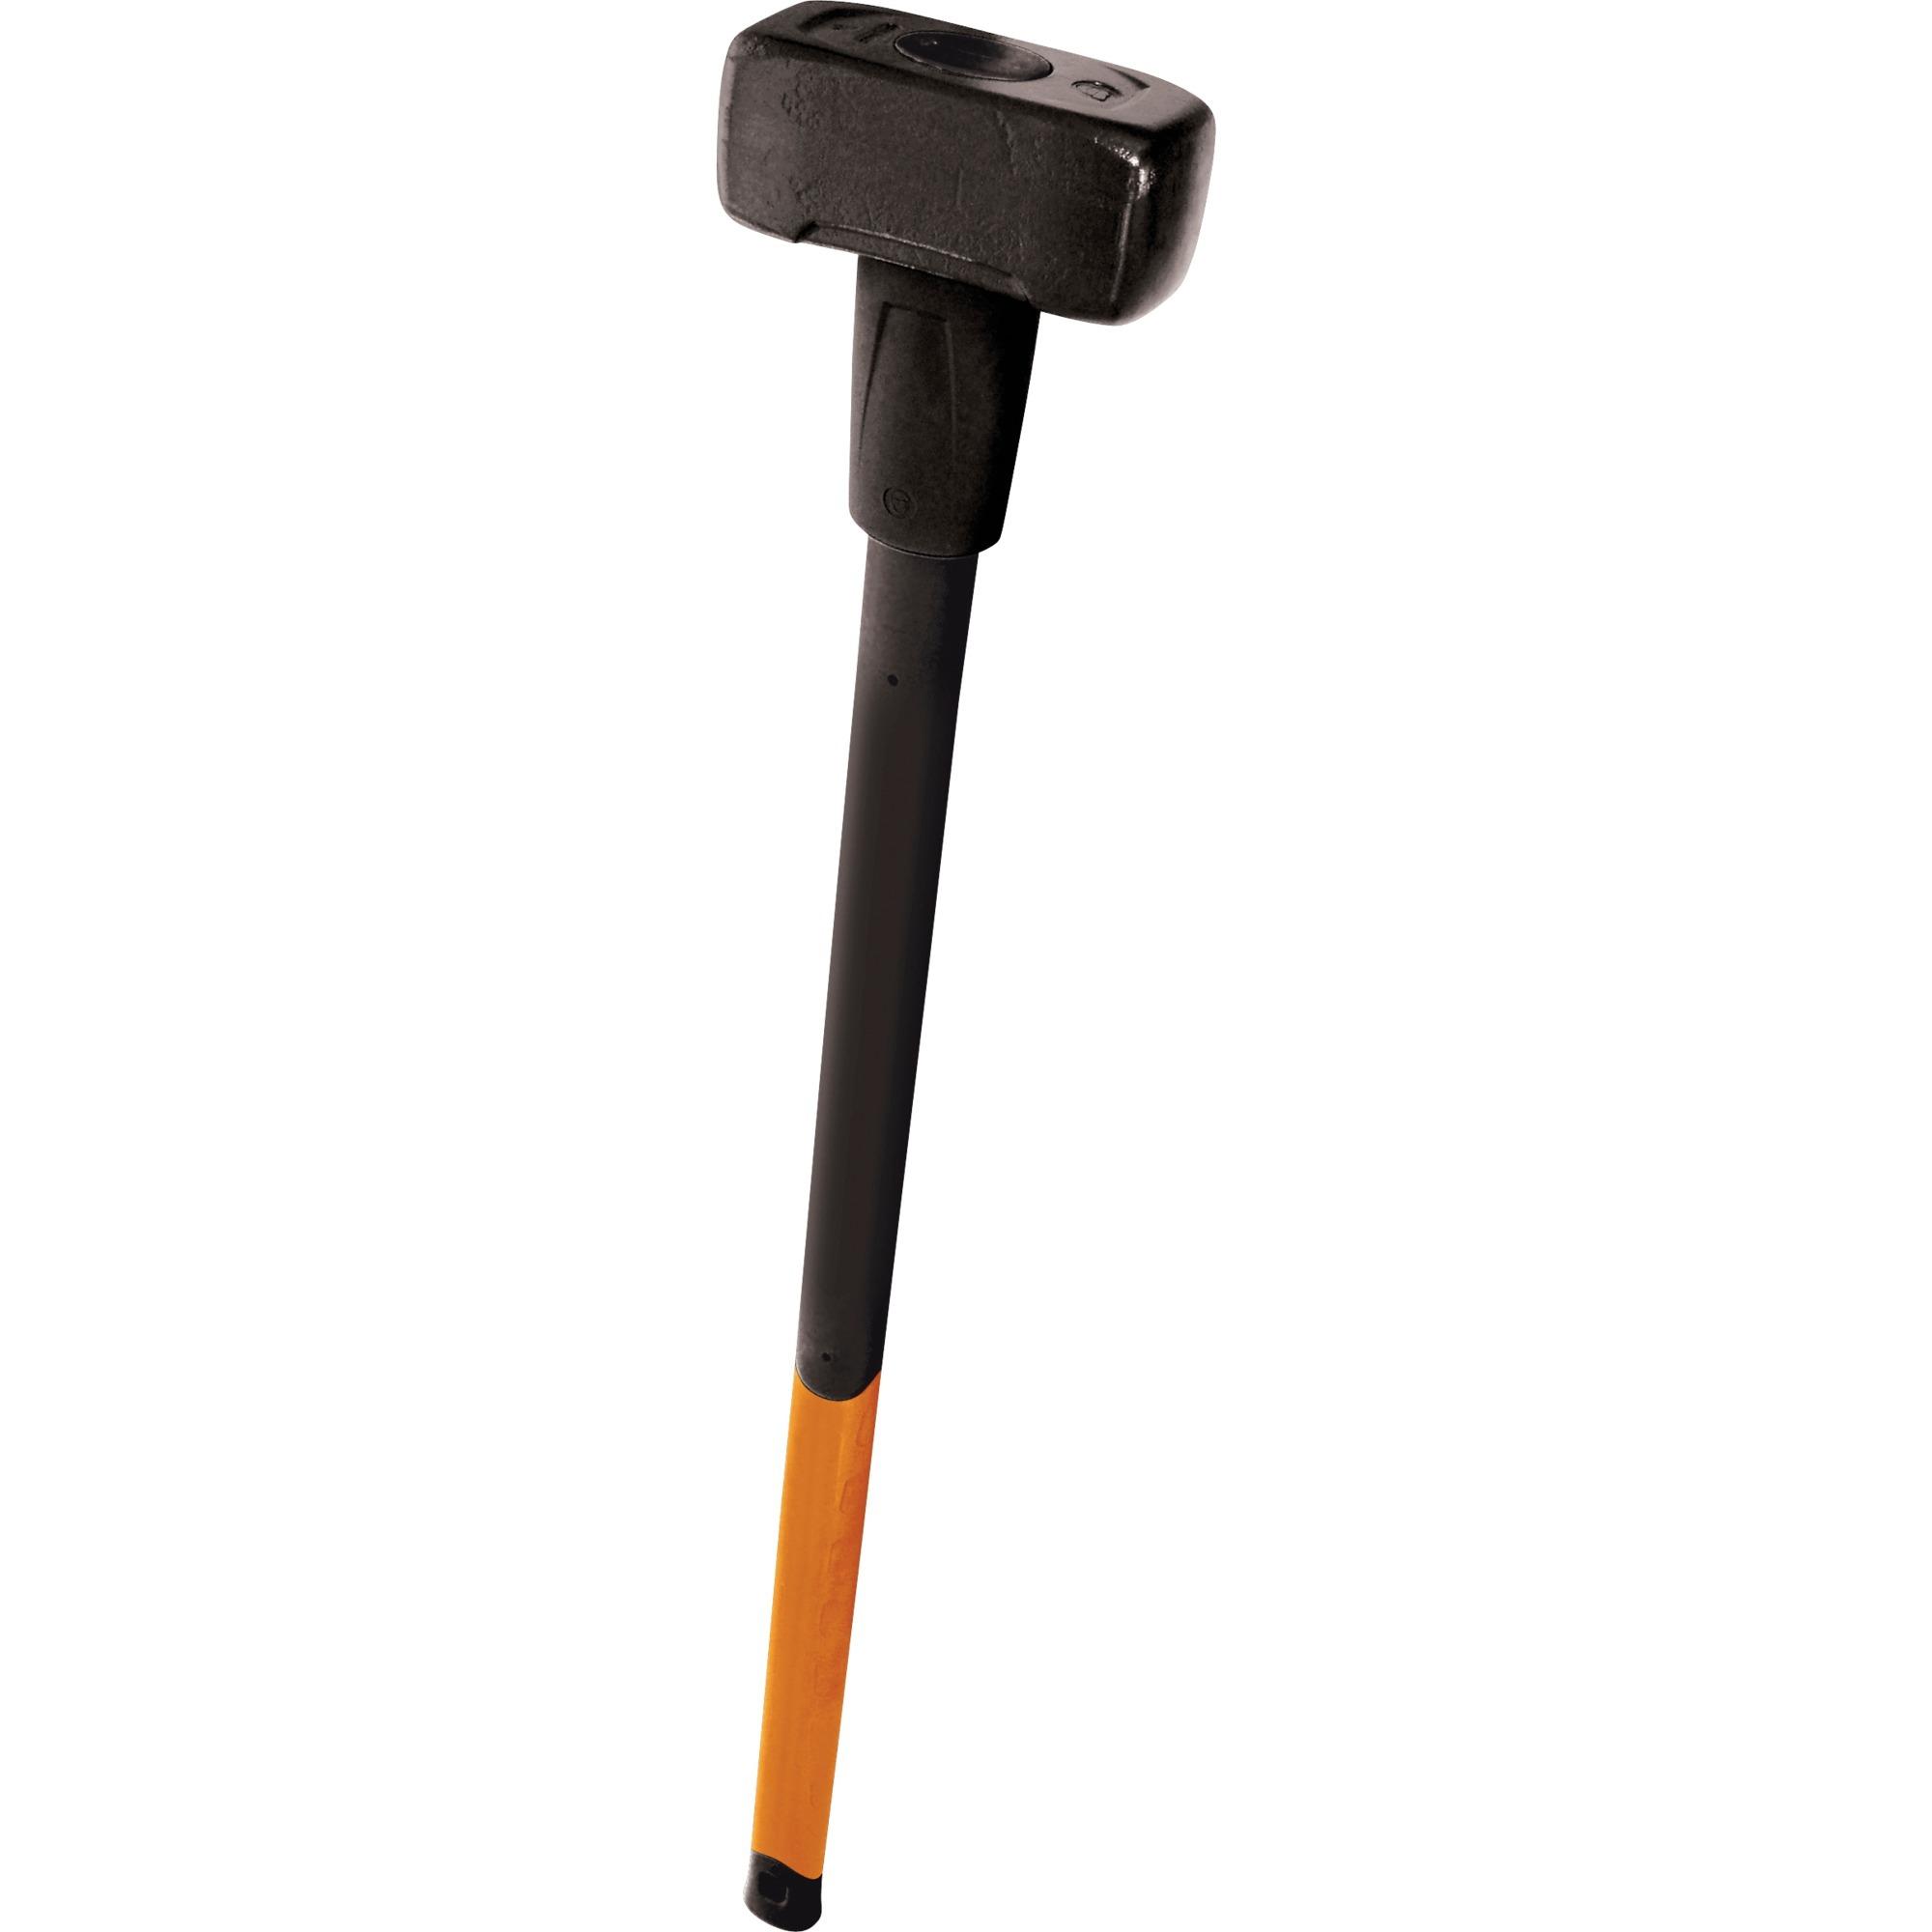 1001431 Maza Negro, Naranja martillo